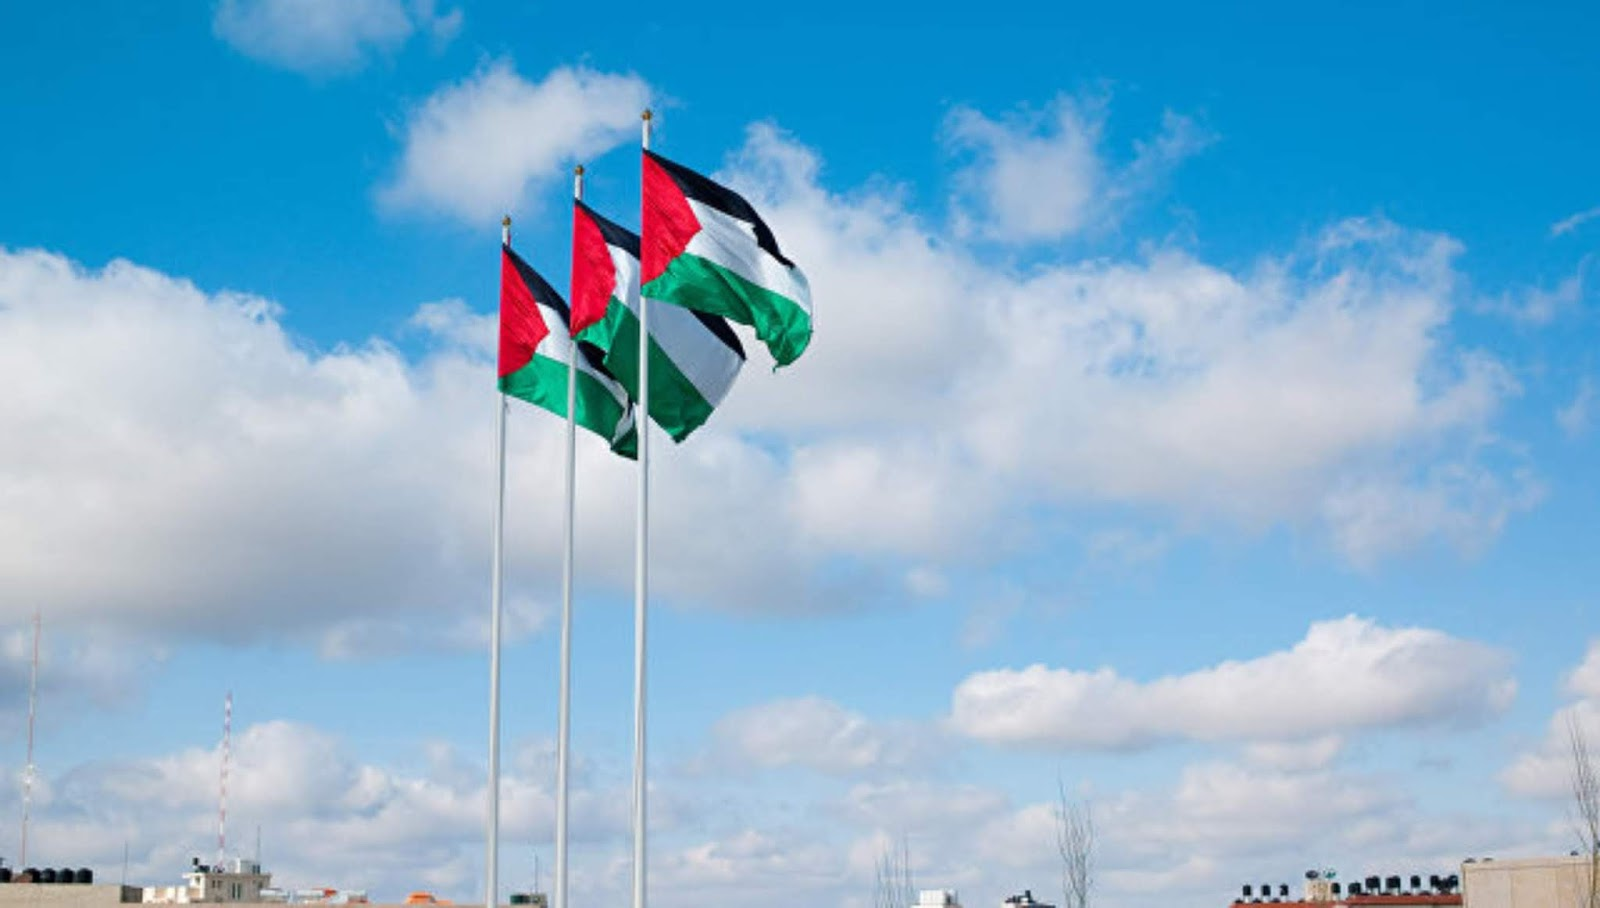 UNESCO menyambut baik kesepakatan antara Israel dan Palestina